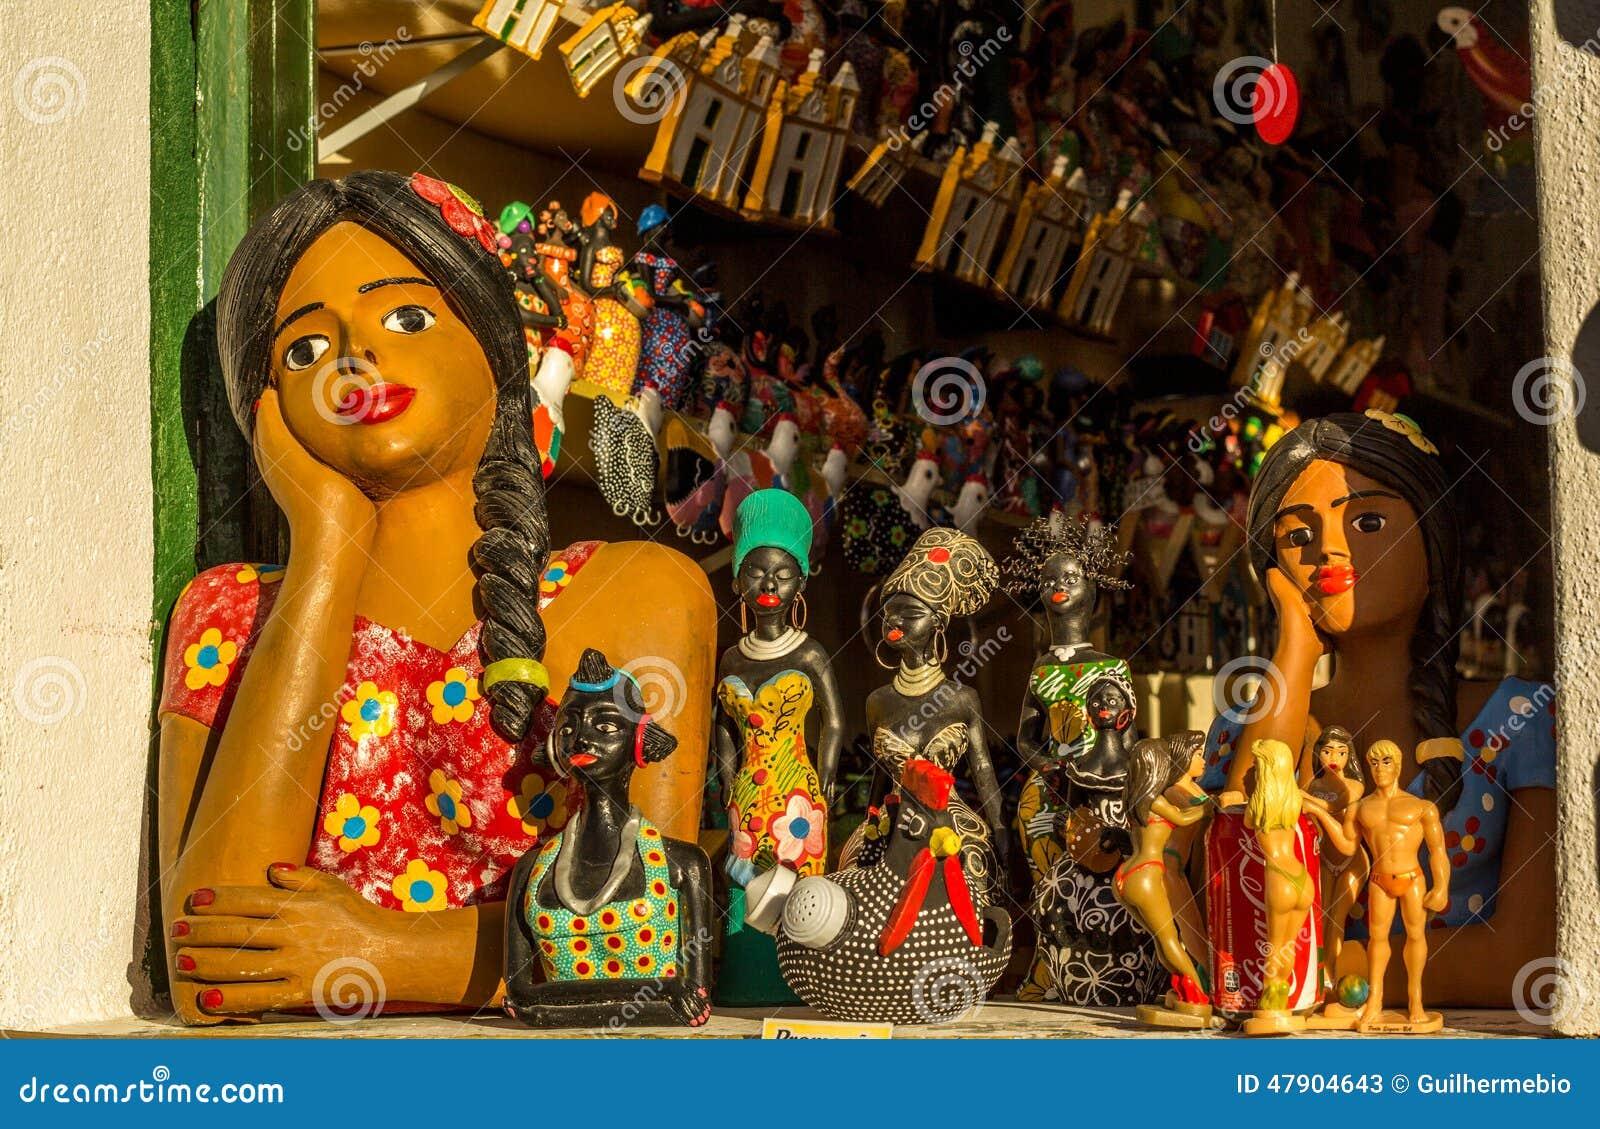 Artesanato Com Papel Mache ~ Artesanato De Baía, Brasil Foto de Stock Editorial Imagem 47904643